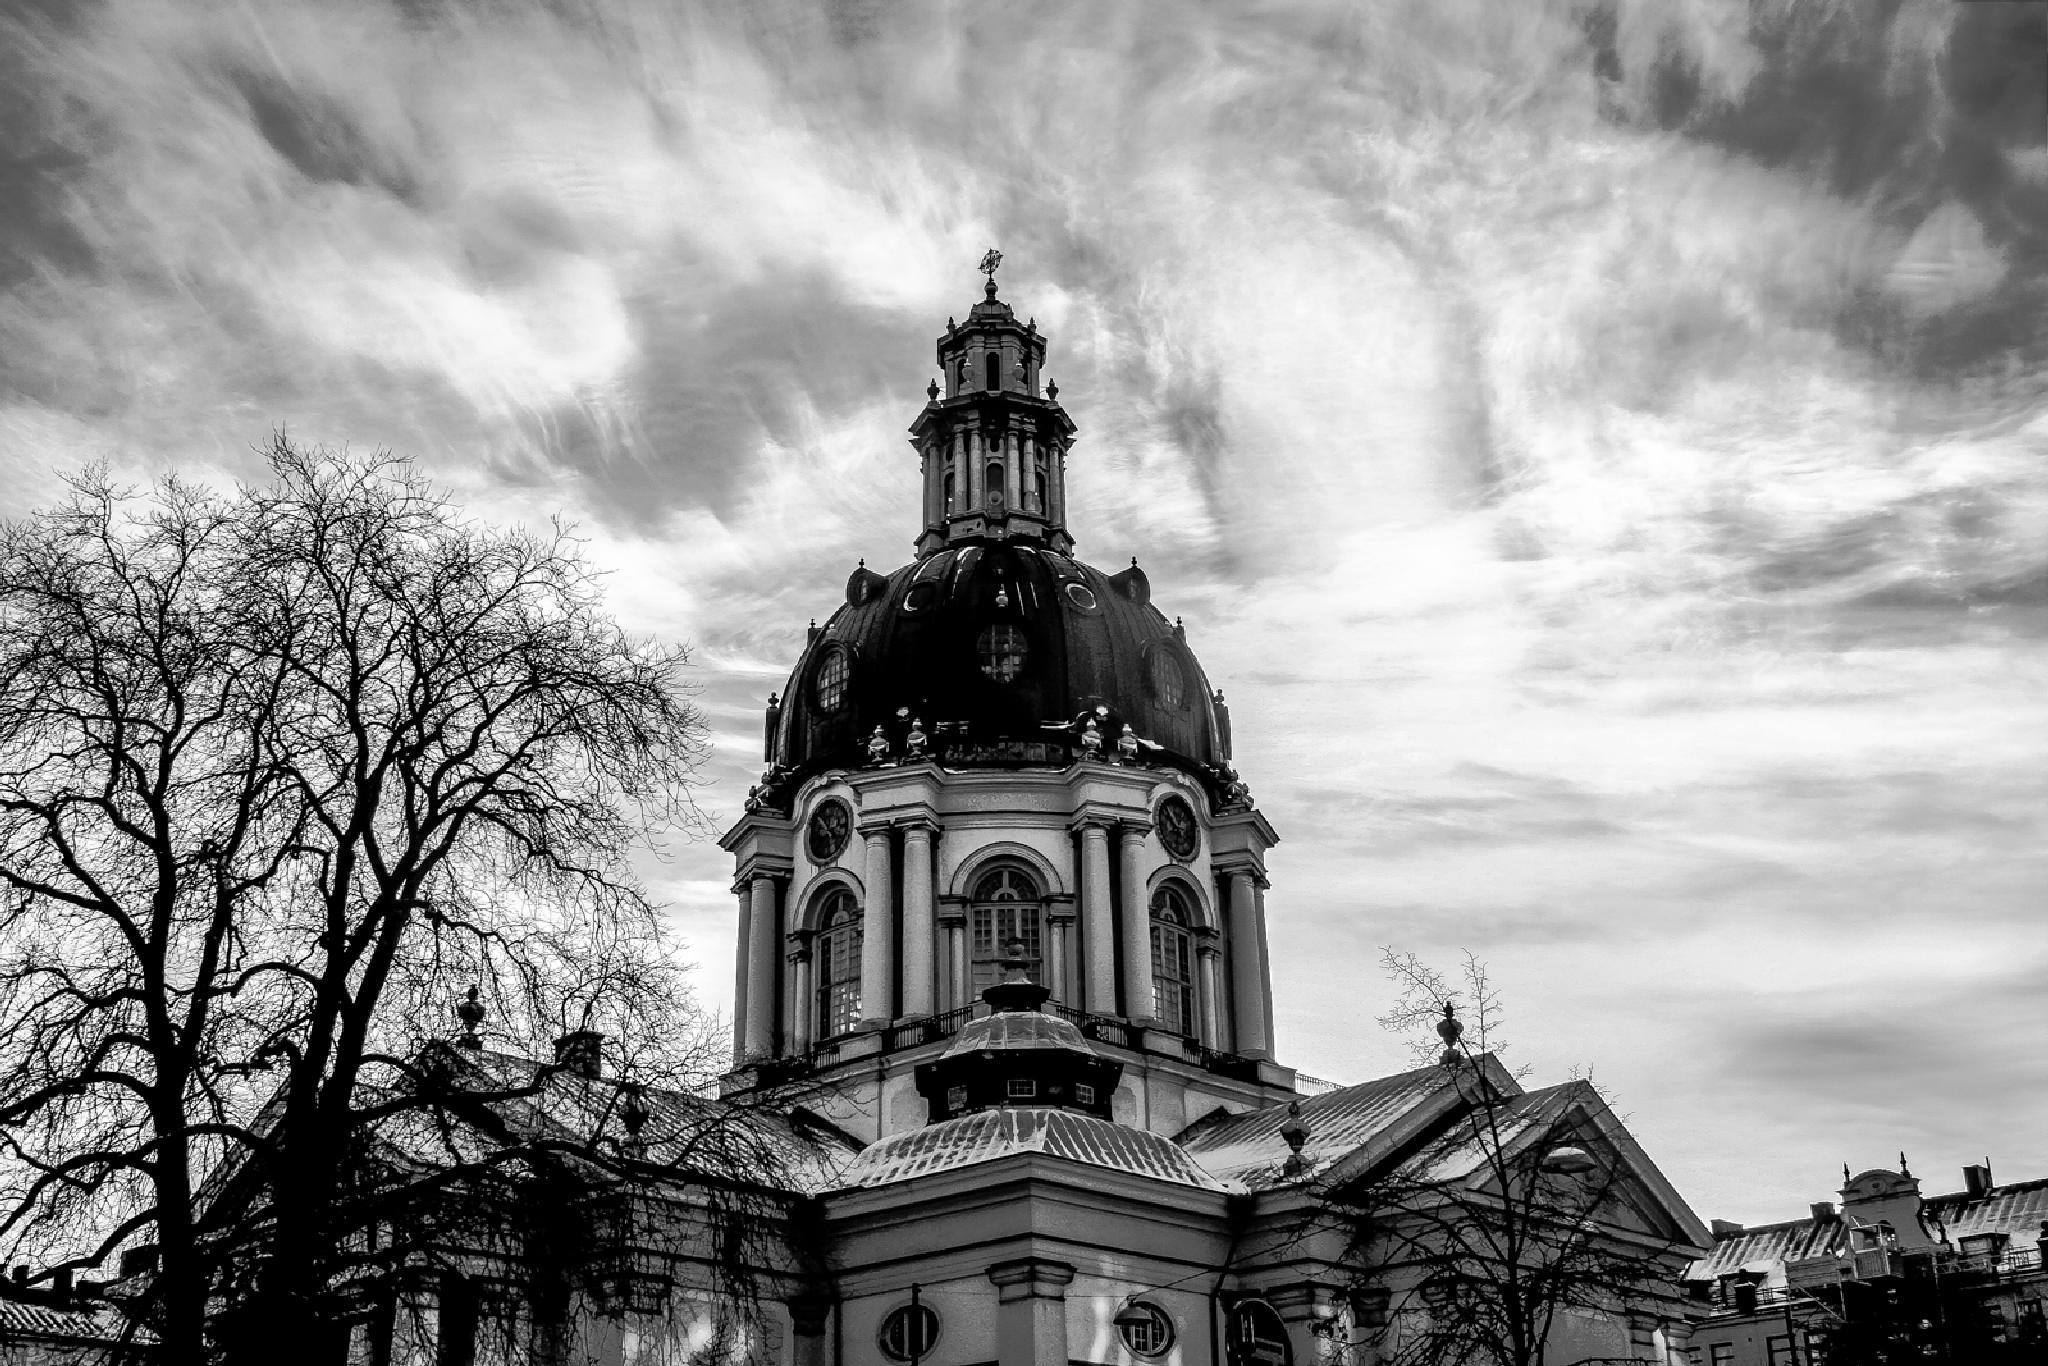 Gustav Vasas Kyrka Stockholm by Alfred Pettersson